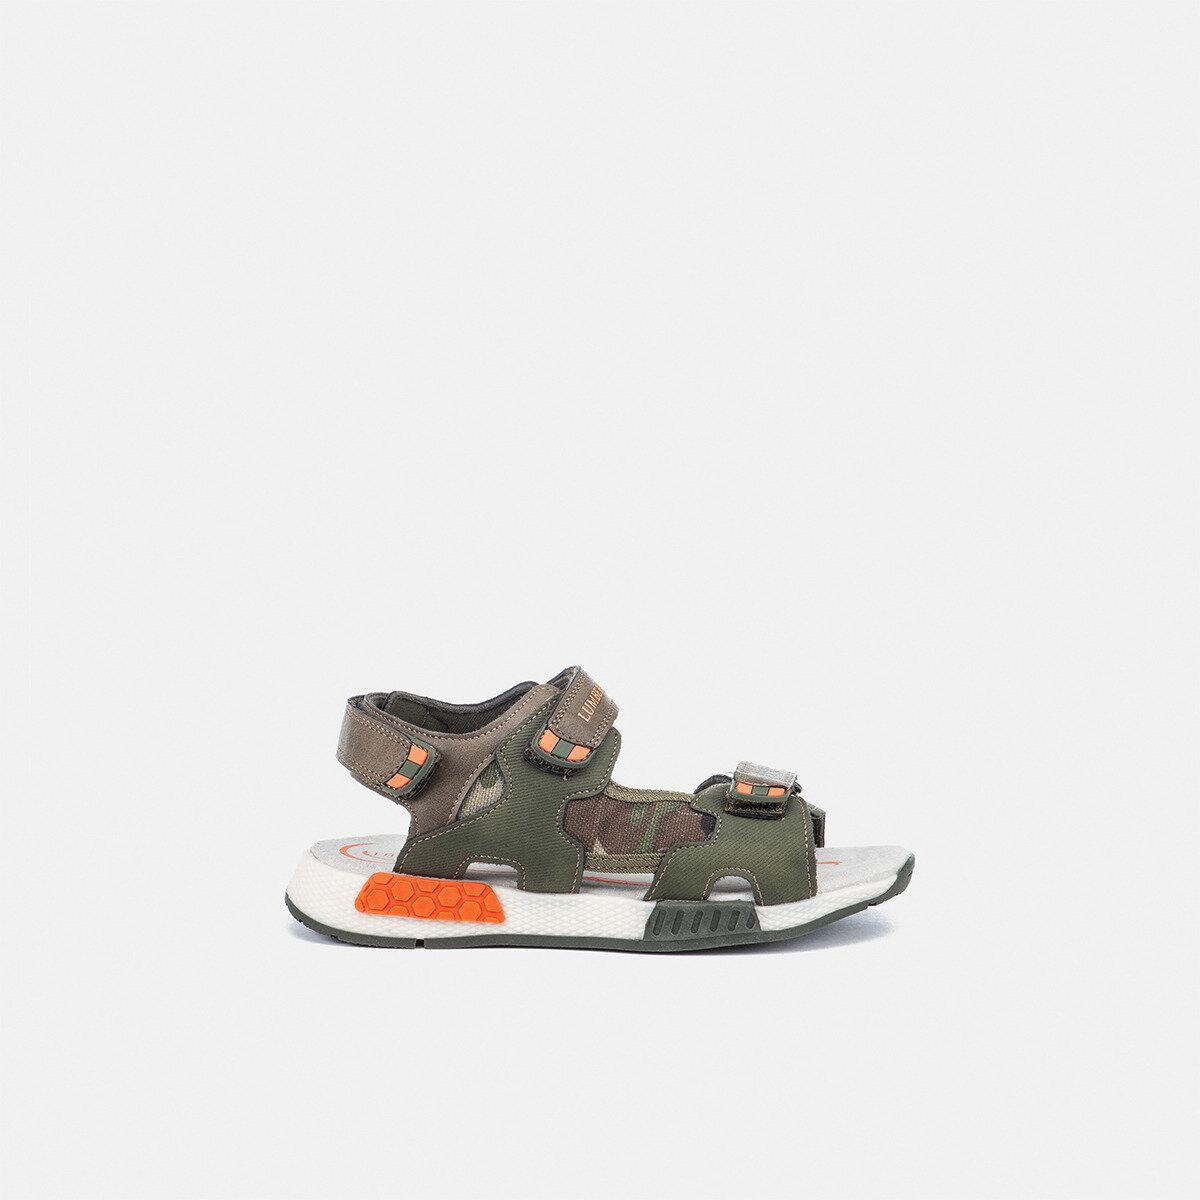 CORSY MILITARY GREEN/ORANGE Boy Sandals